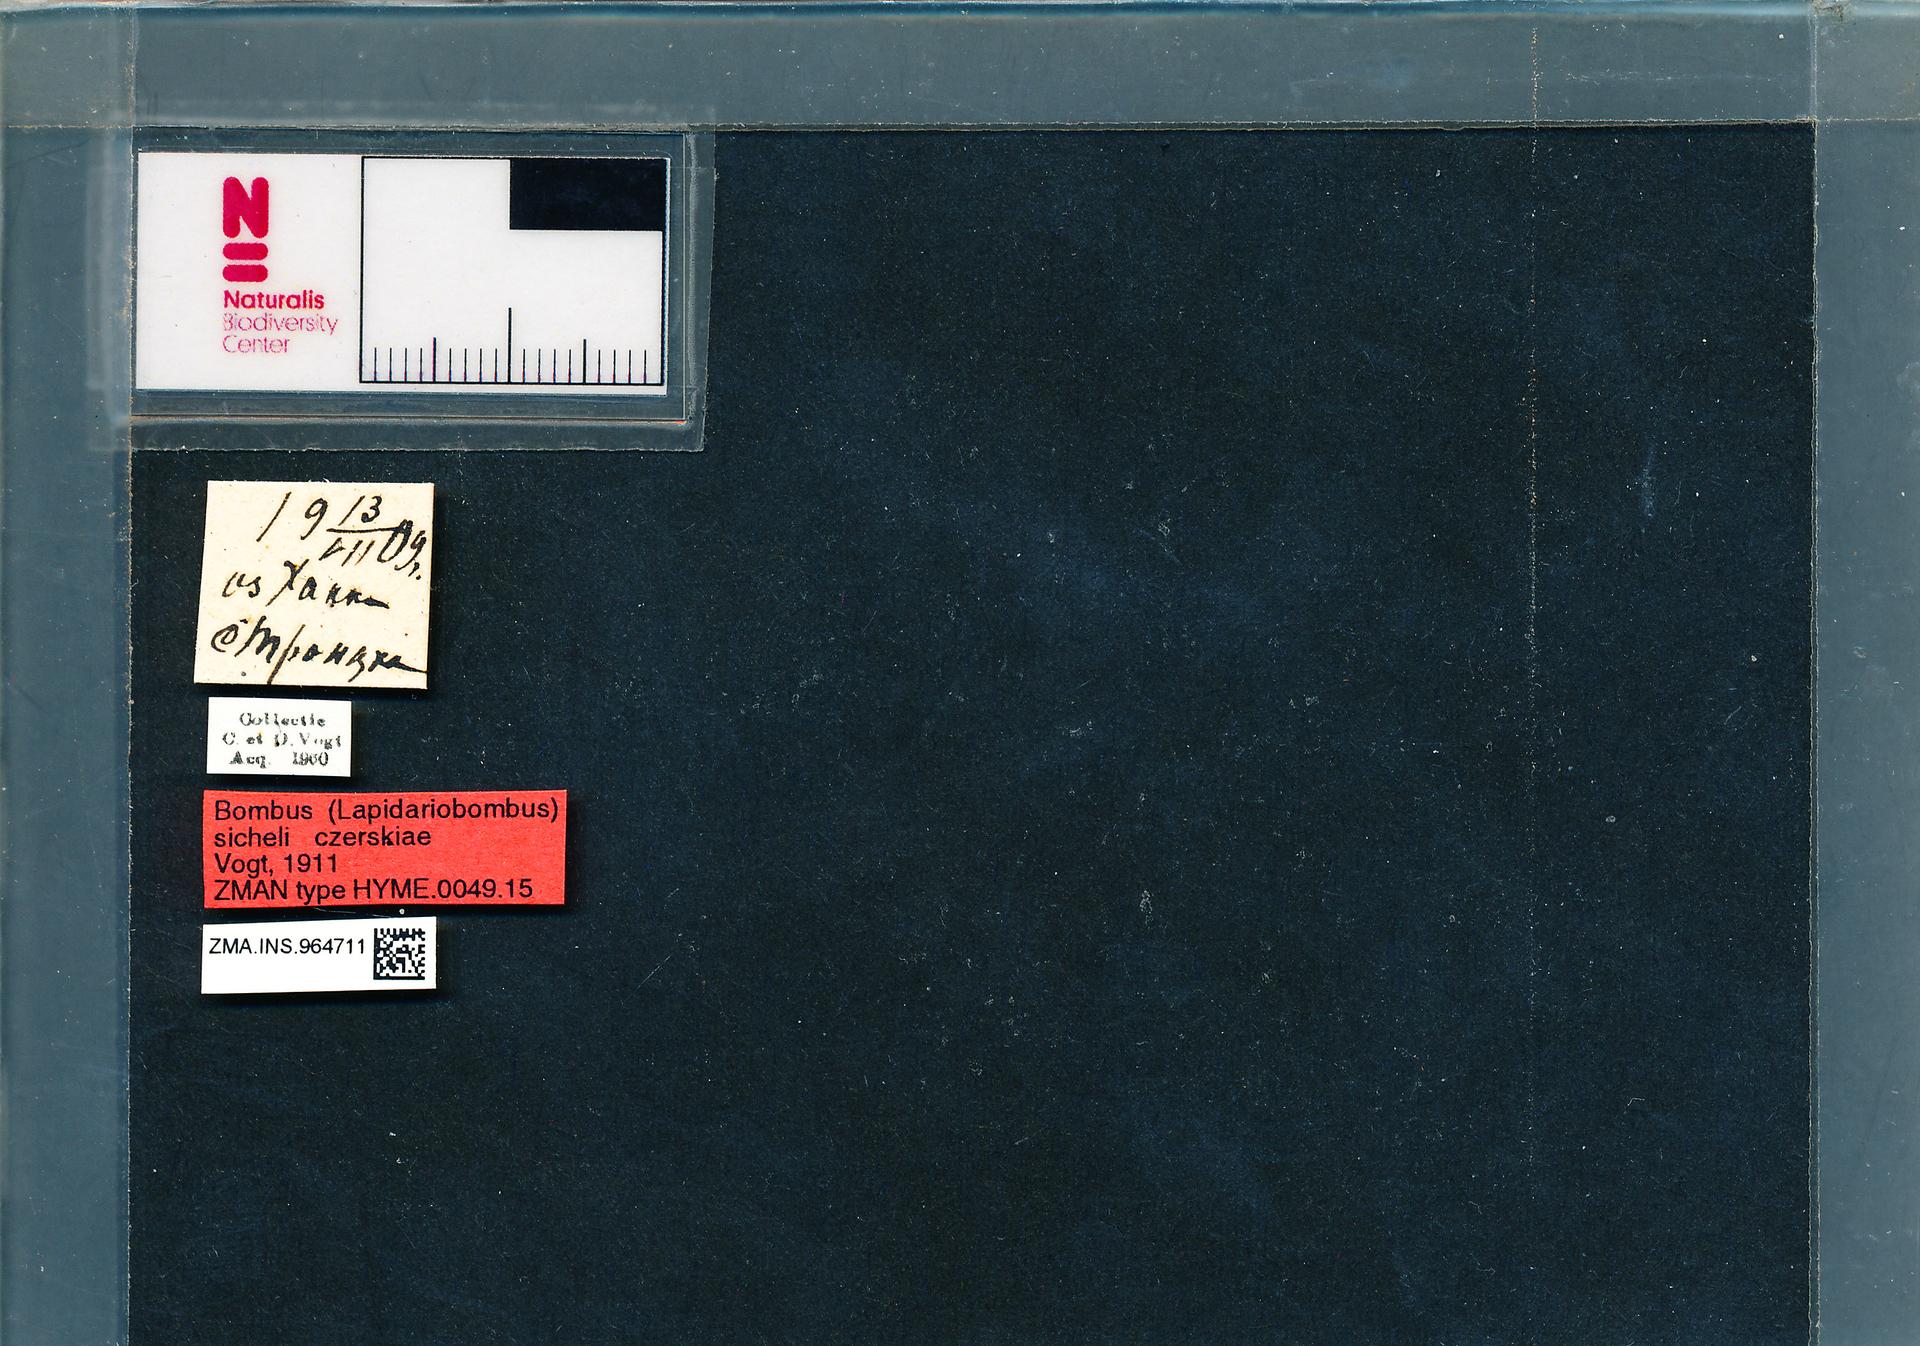 ZMA.INS.964711 | Bombus (Melanobombus) sichelii uniens Vogt, 1911